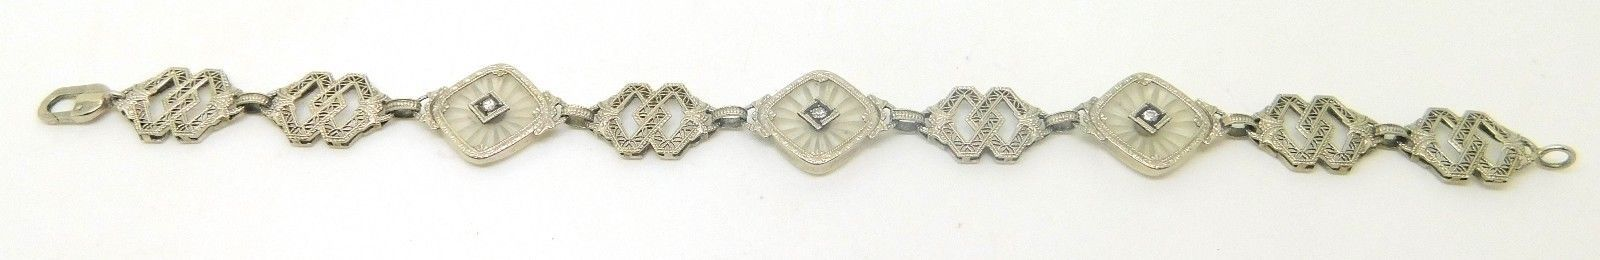 10k Gold Filigree / Art Deco Genuine Natural Camphor Bracelet w/Diamonds #J3826